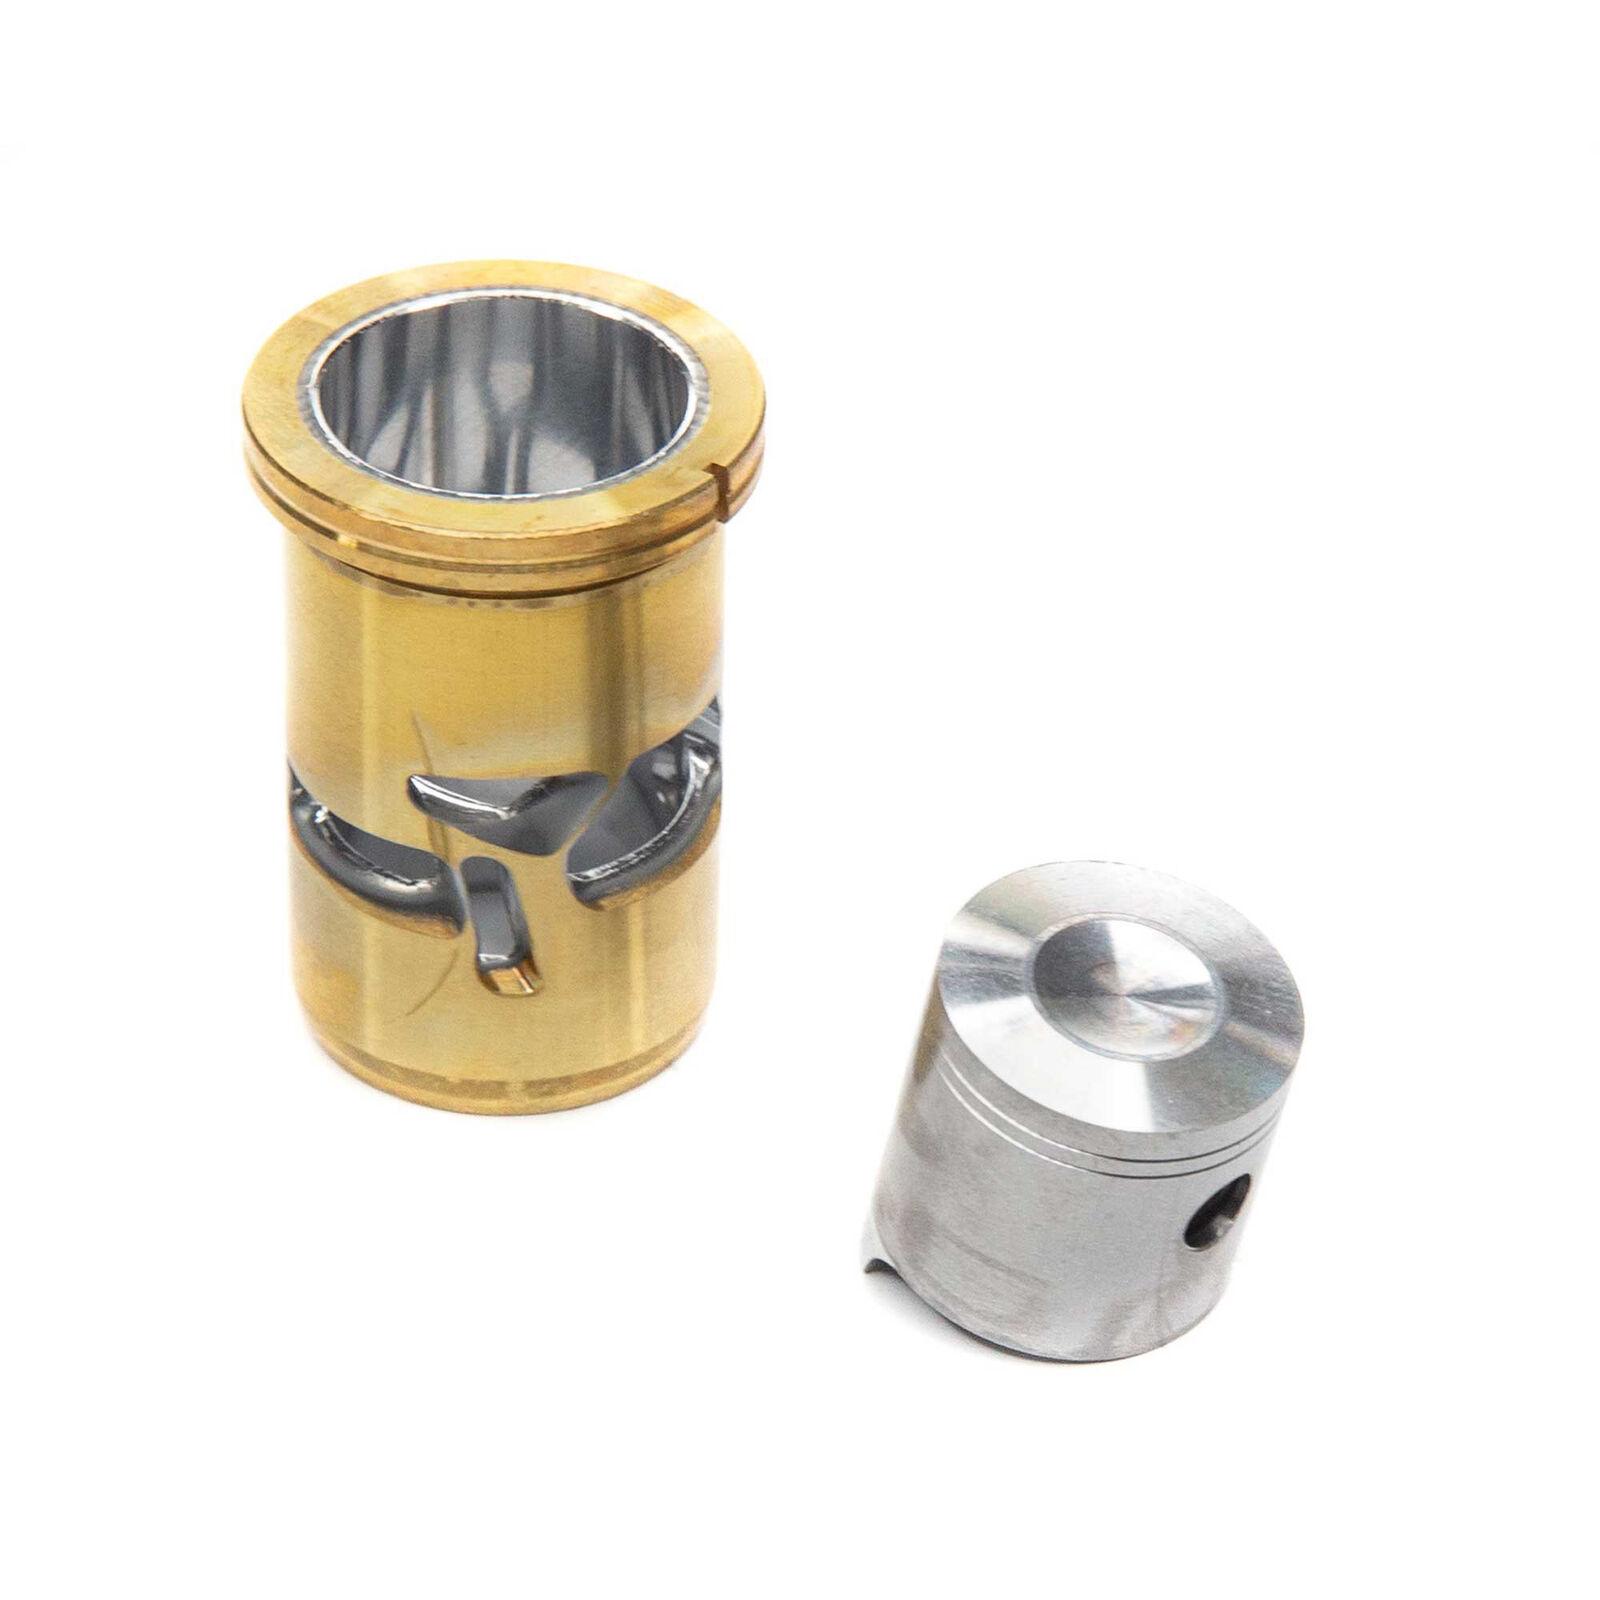 Cylinder Piston Assembly: R21